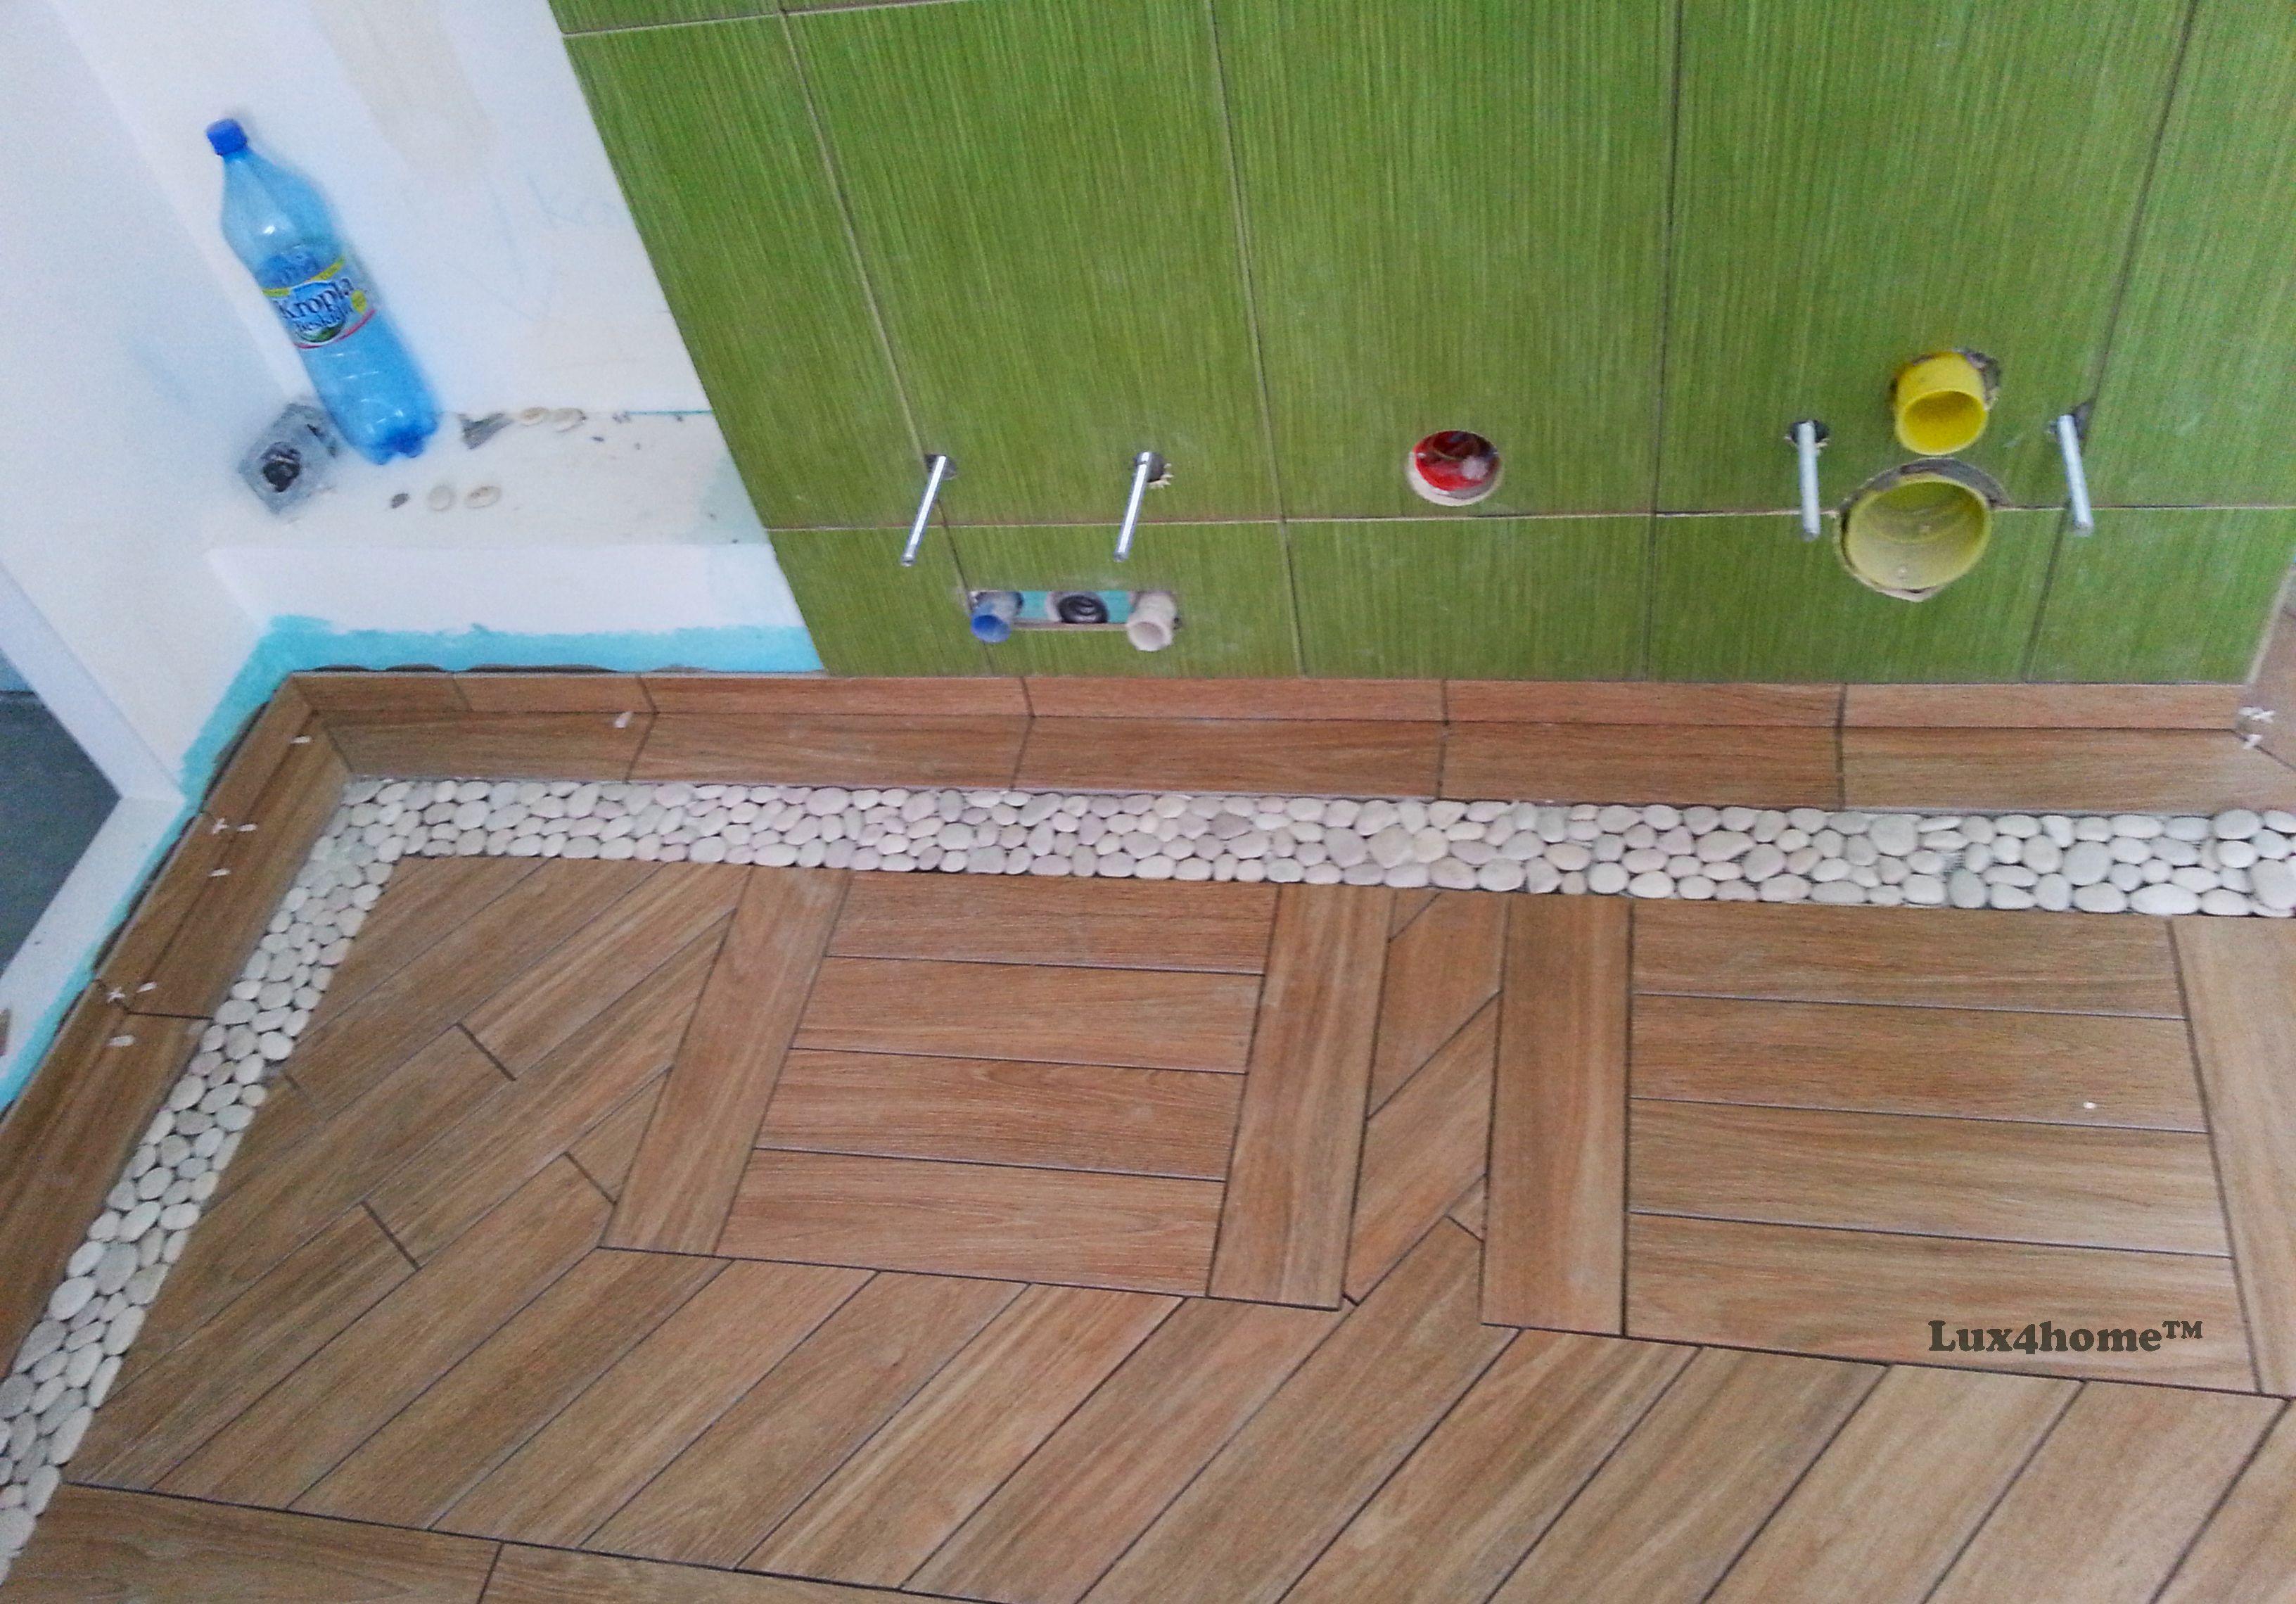 White #Pebble Tiles #Bathroom Ideas - Pebble Tile #Bathtub. We are ...